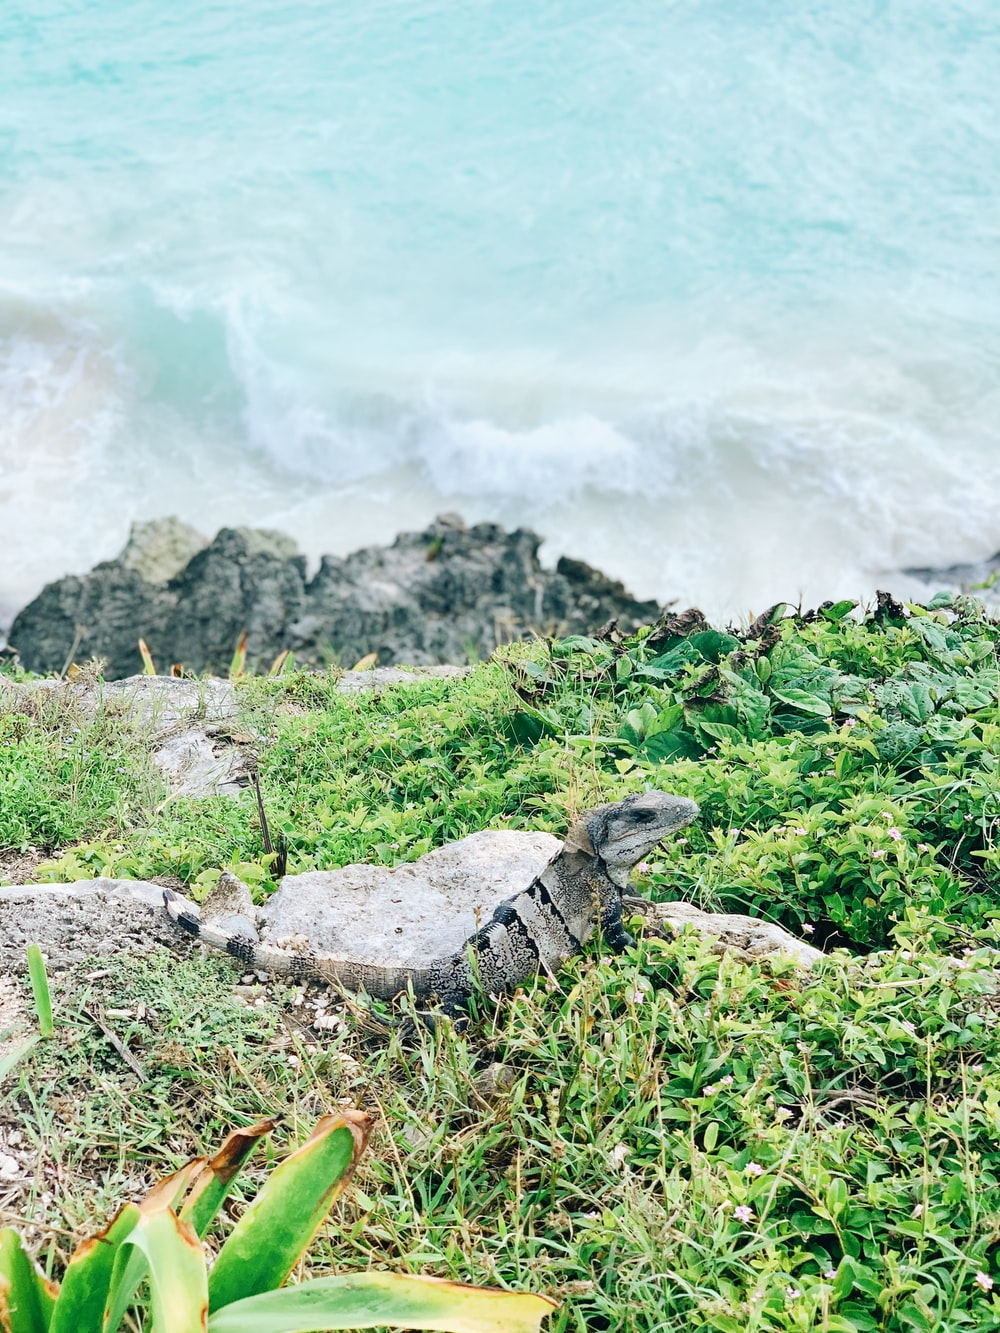 gray and black lizard on gray rock